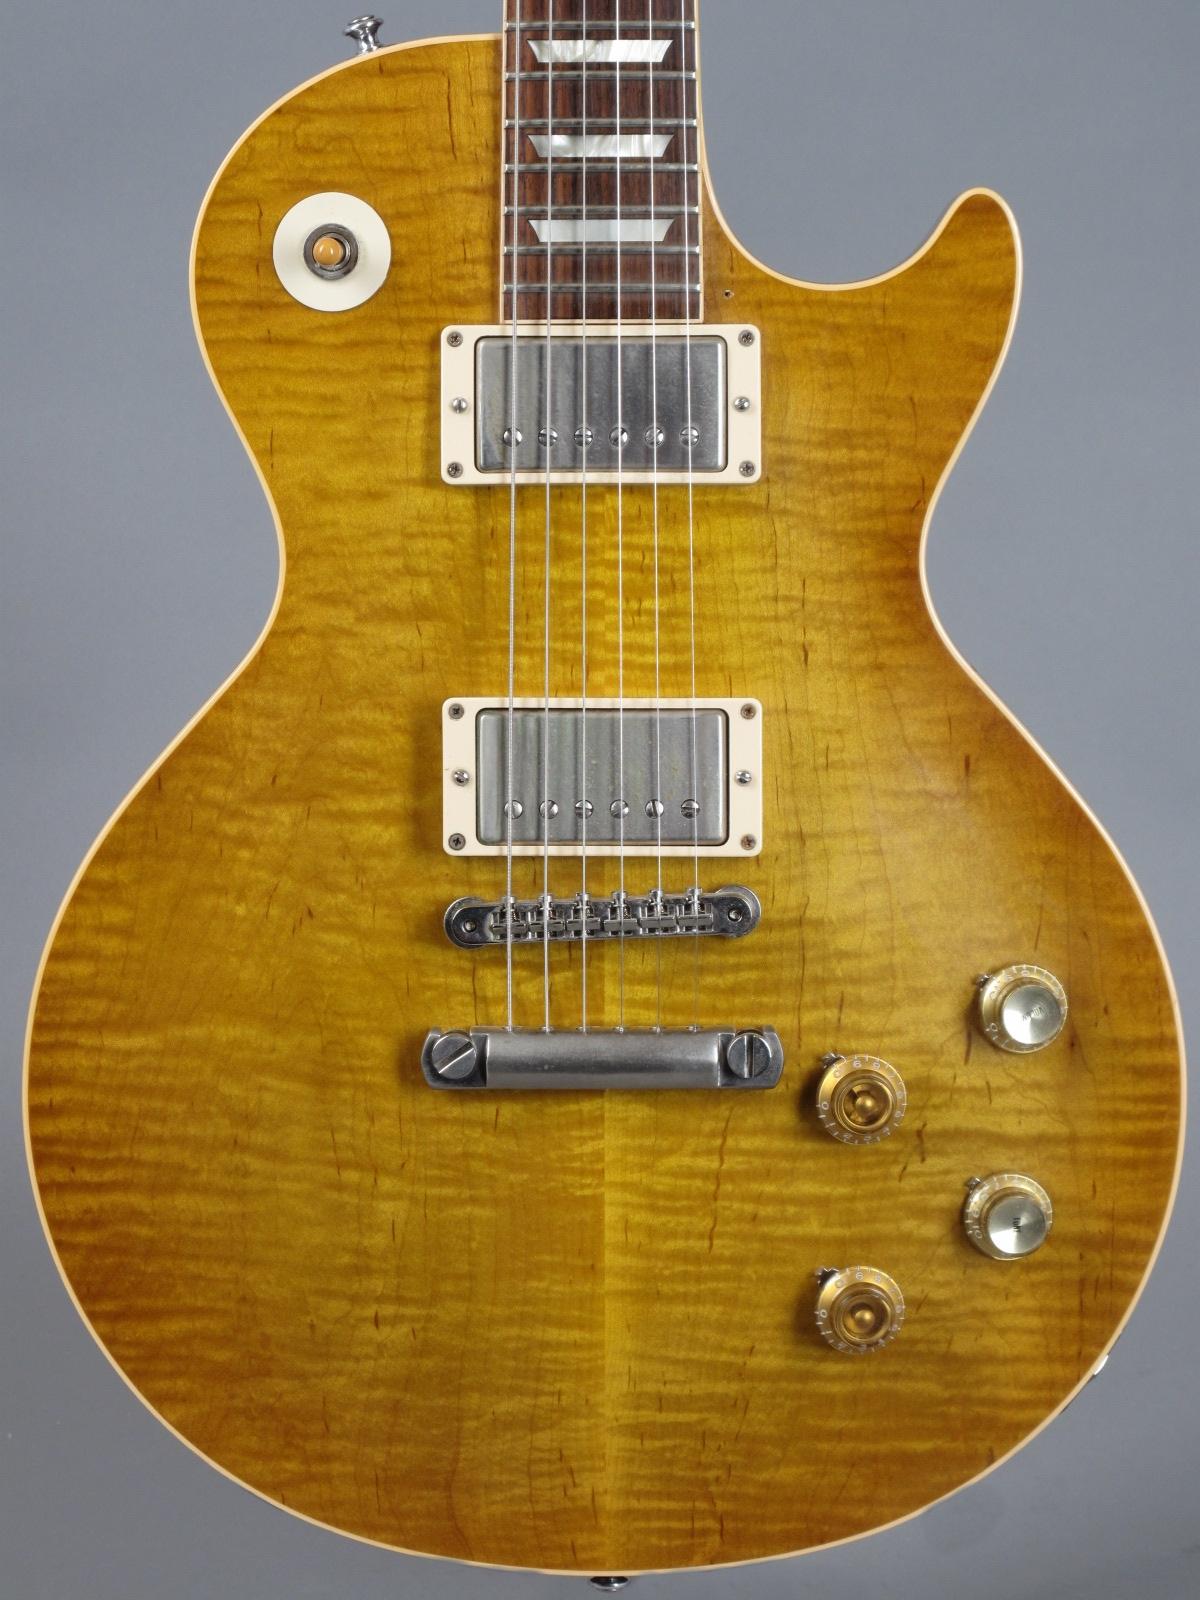 2010 Gibson Les Paul - Melvin Franks / Greeny/ Gary Moore - CC01